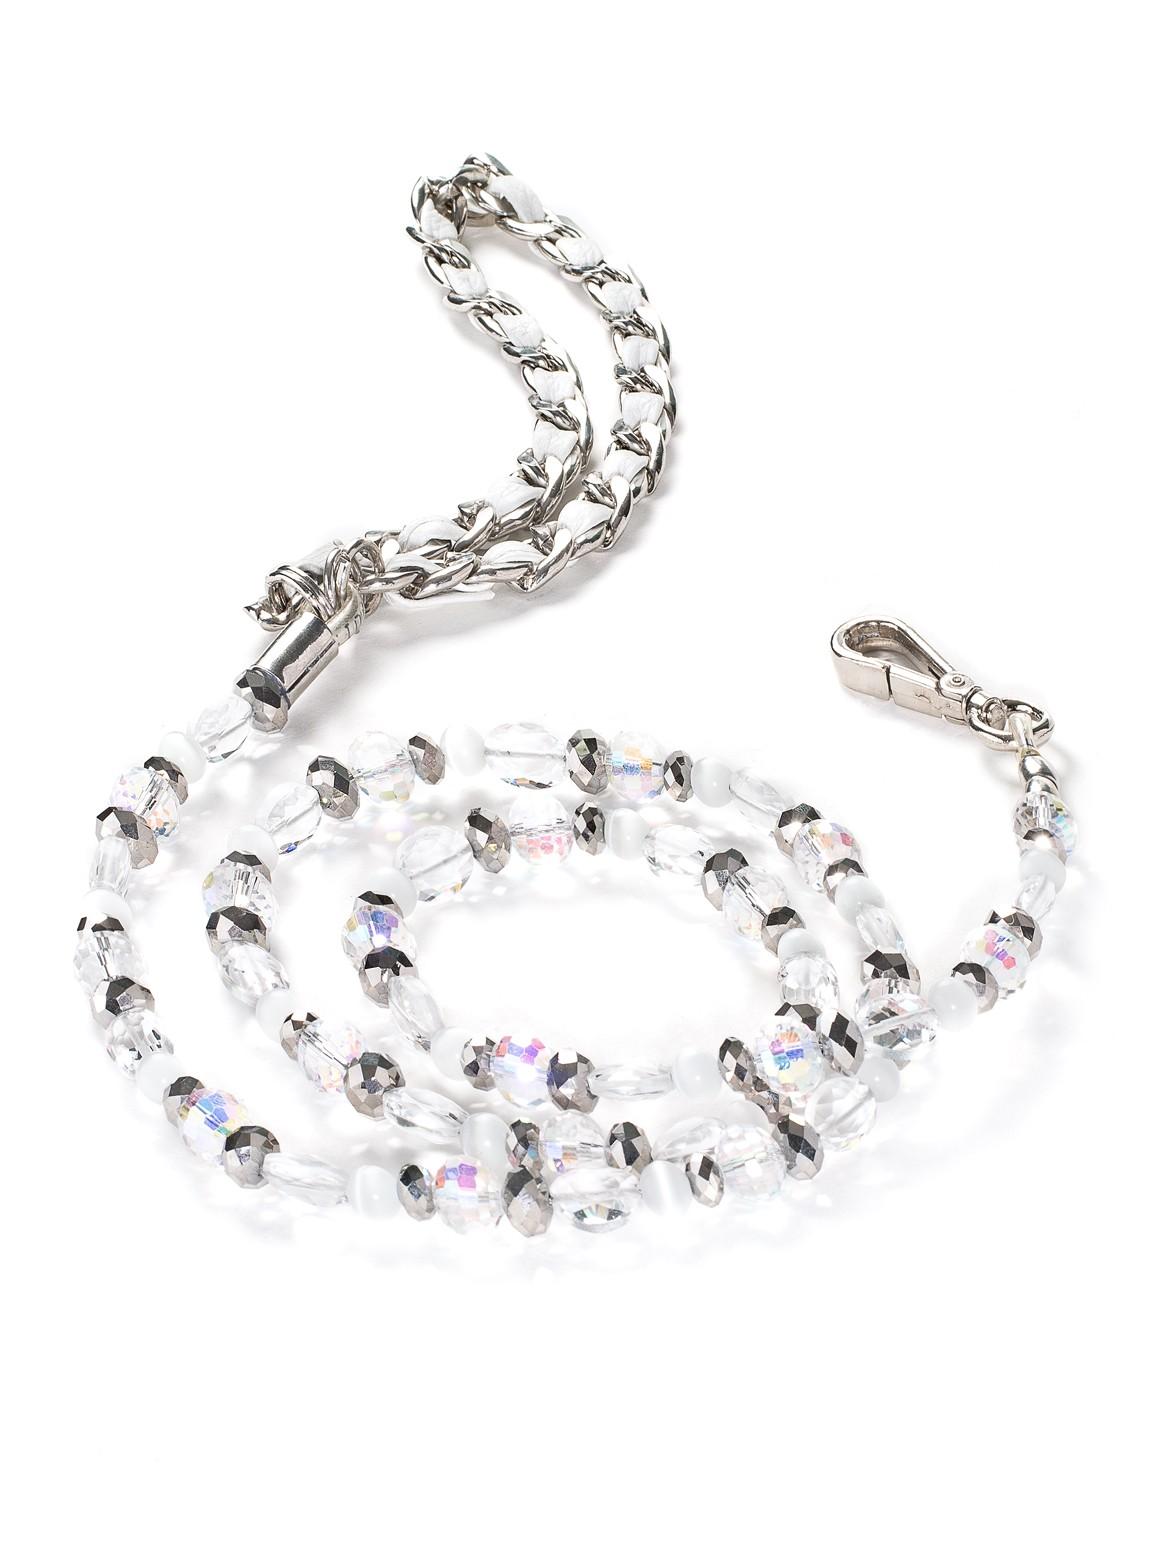 Fabuleash 5th Avenue Crystal Beaded Leash